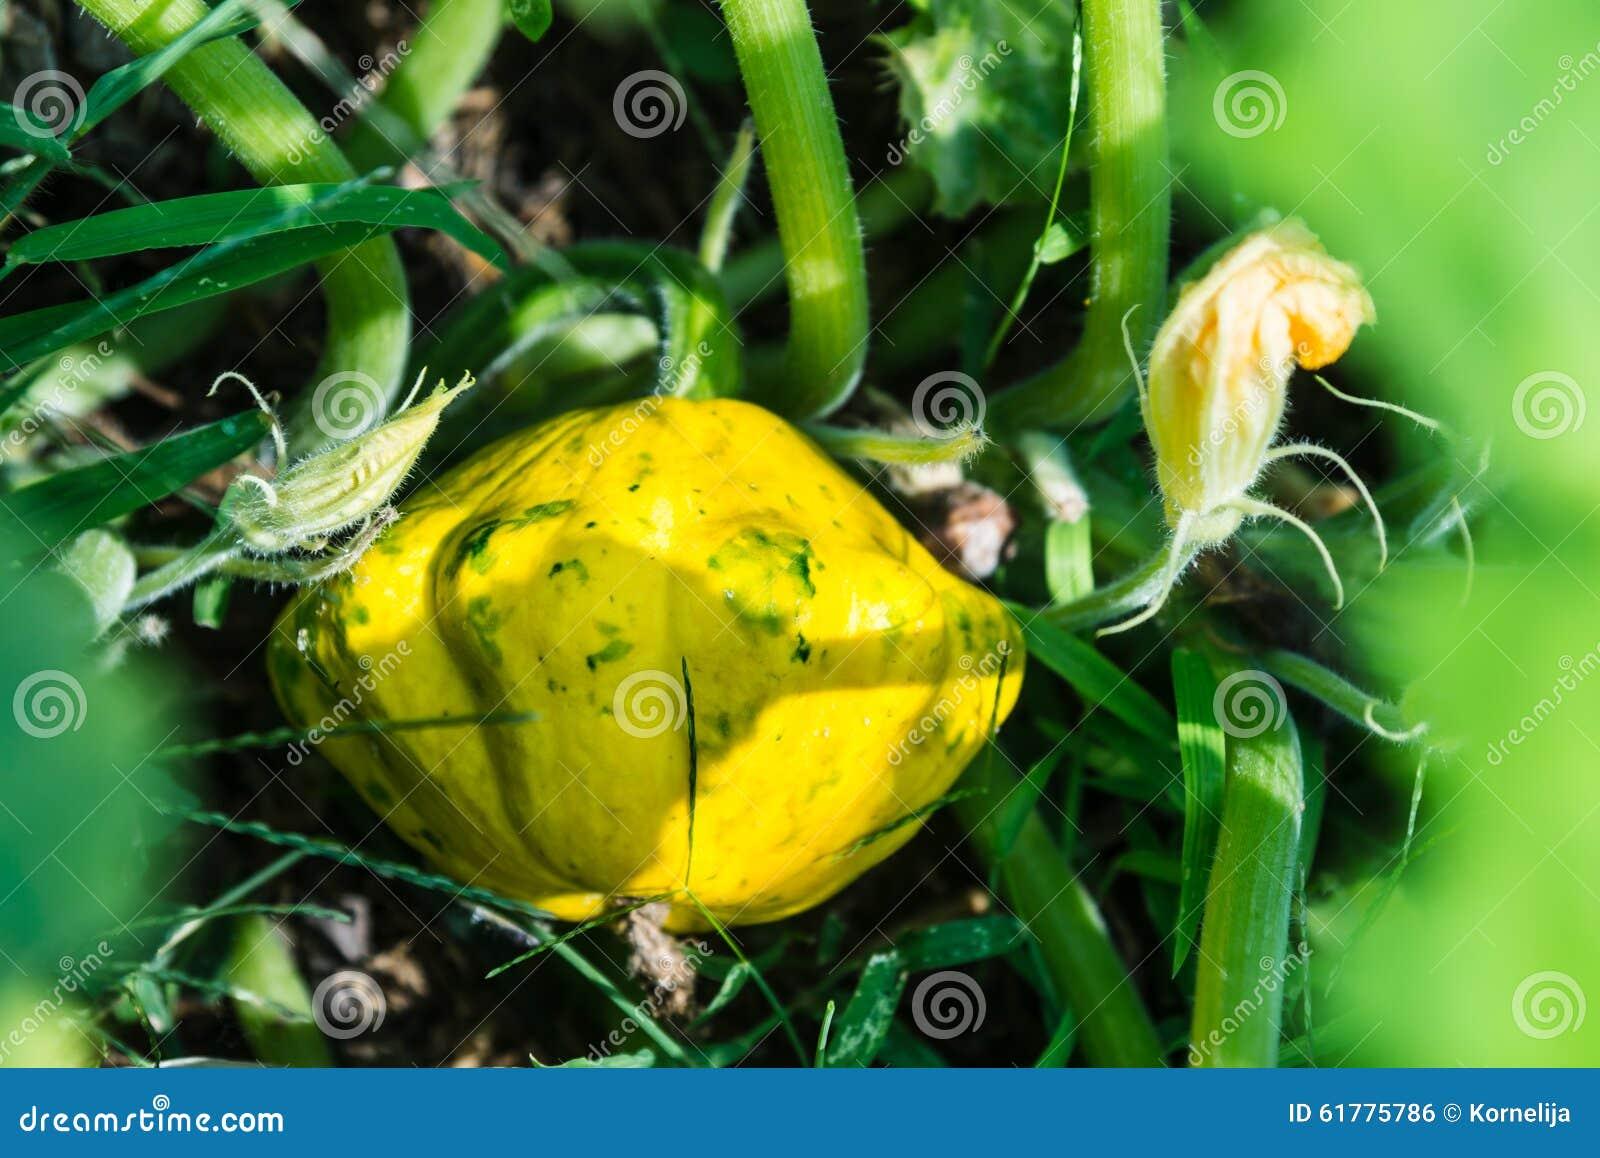 Pumpkin fruit on plant